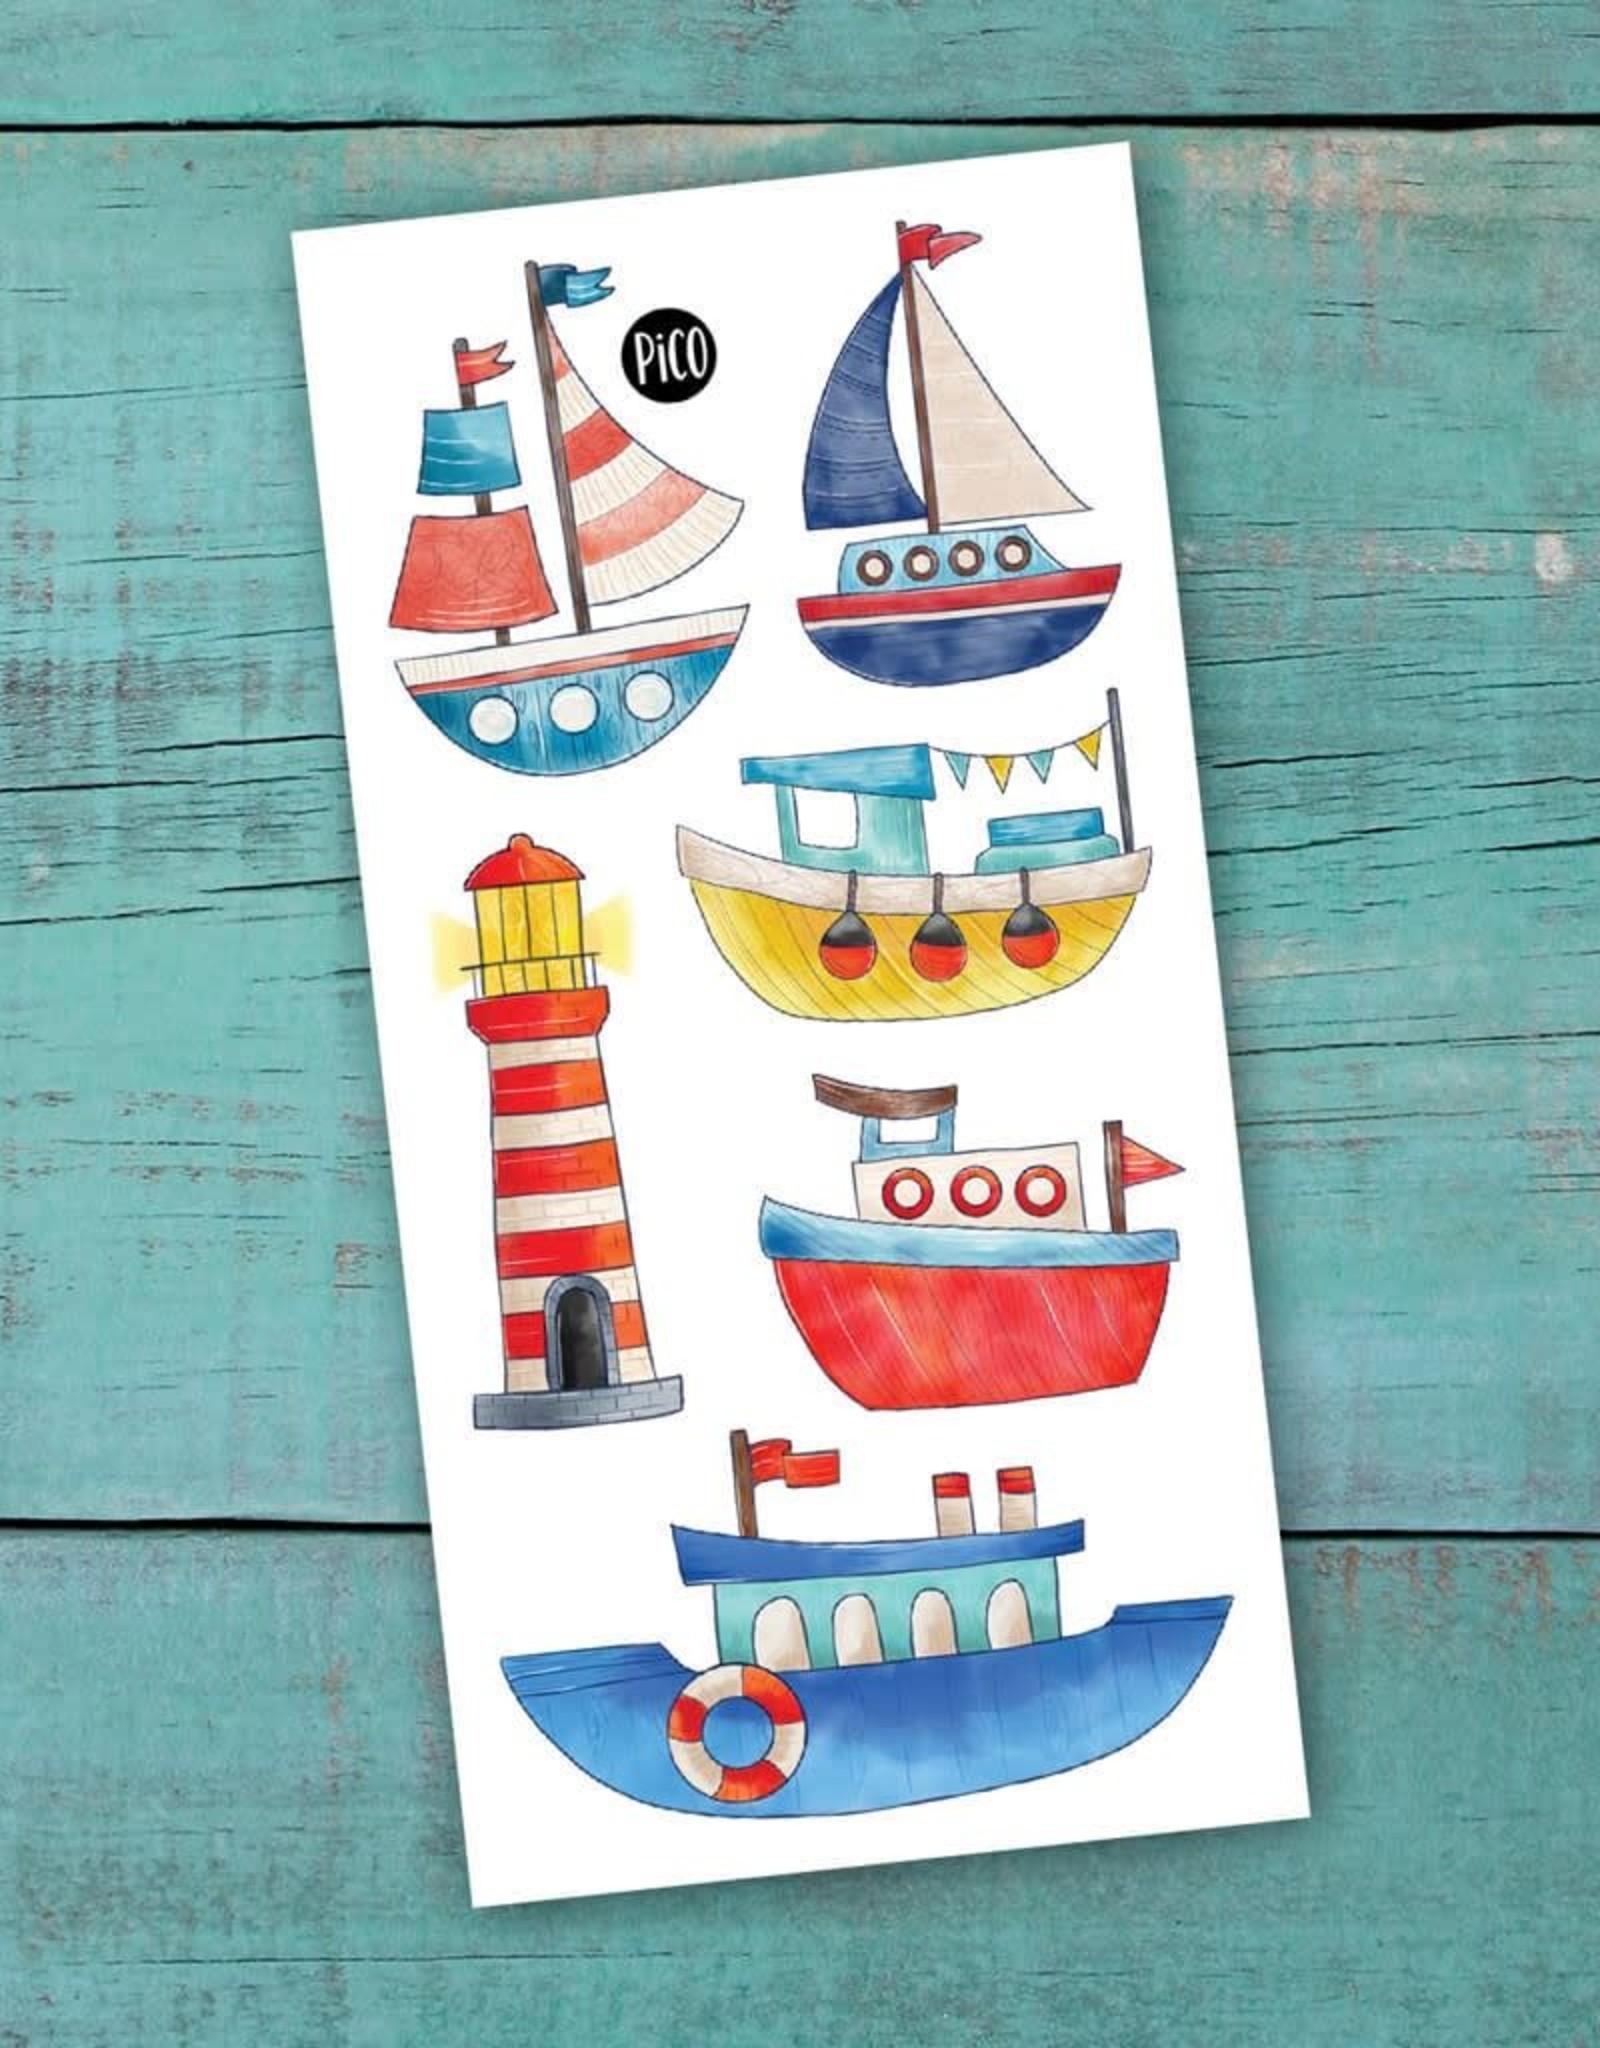 Pico Tattoo - Sail My Boat